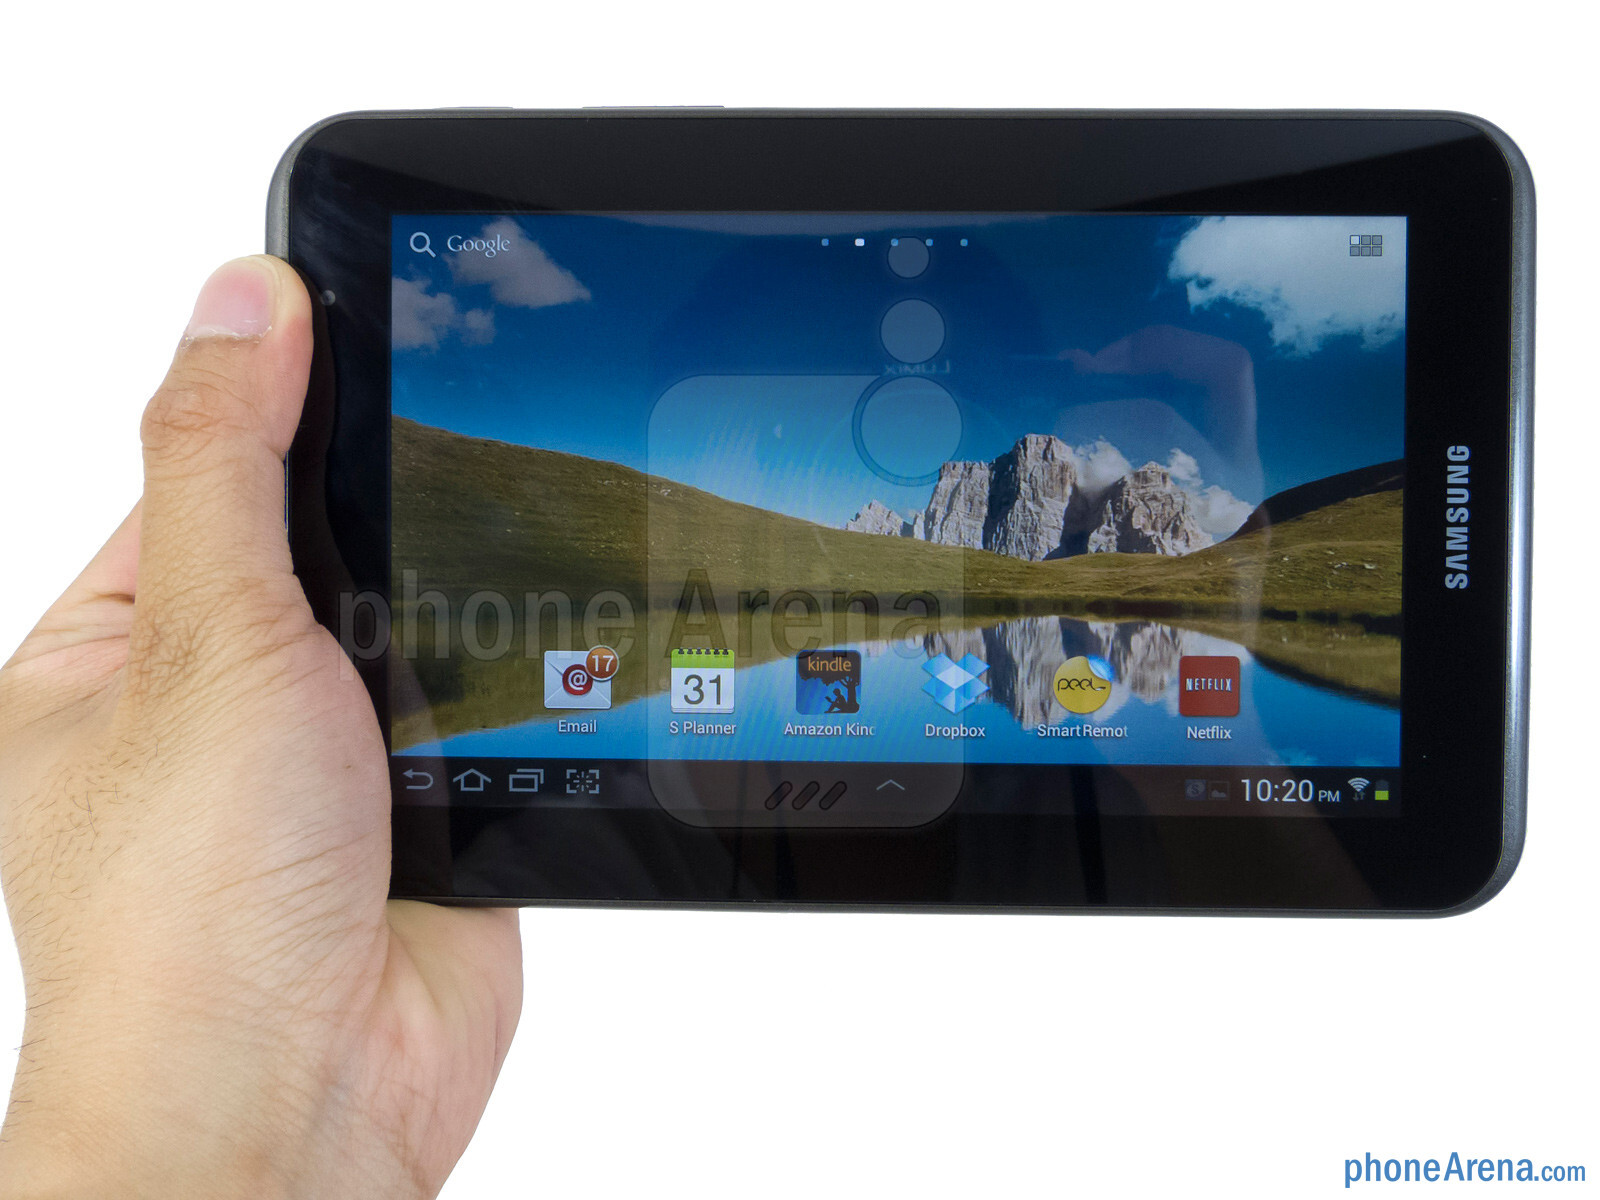 Samsung Galaxy Tab 2 (7.0) Review